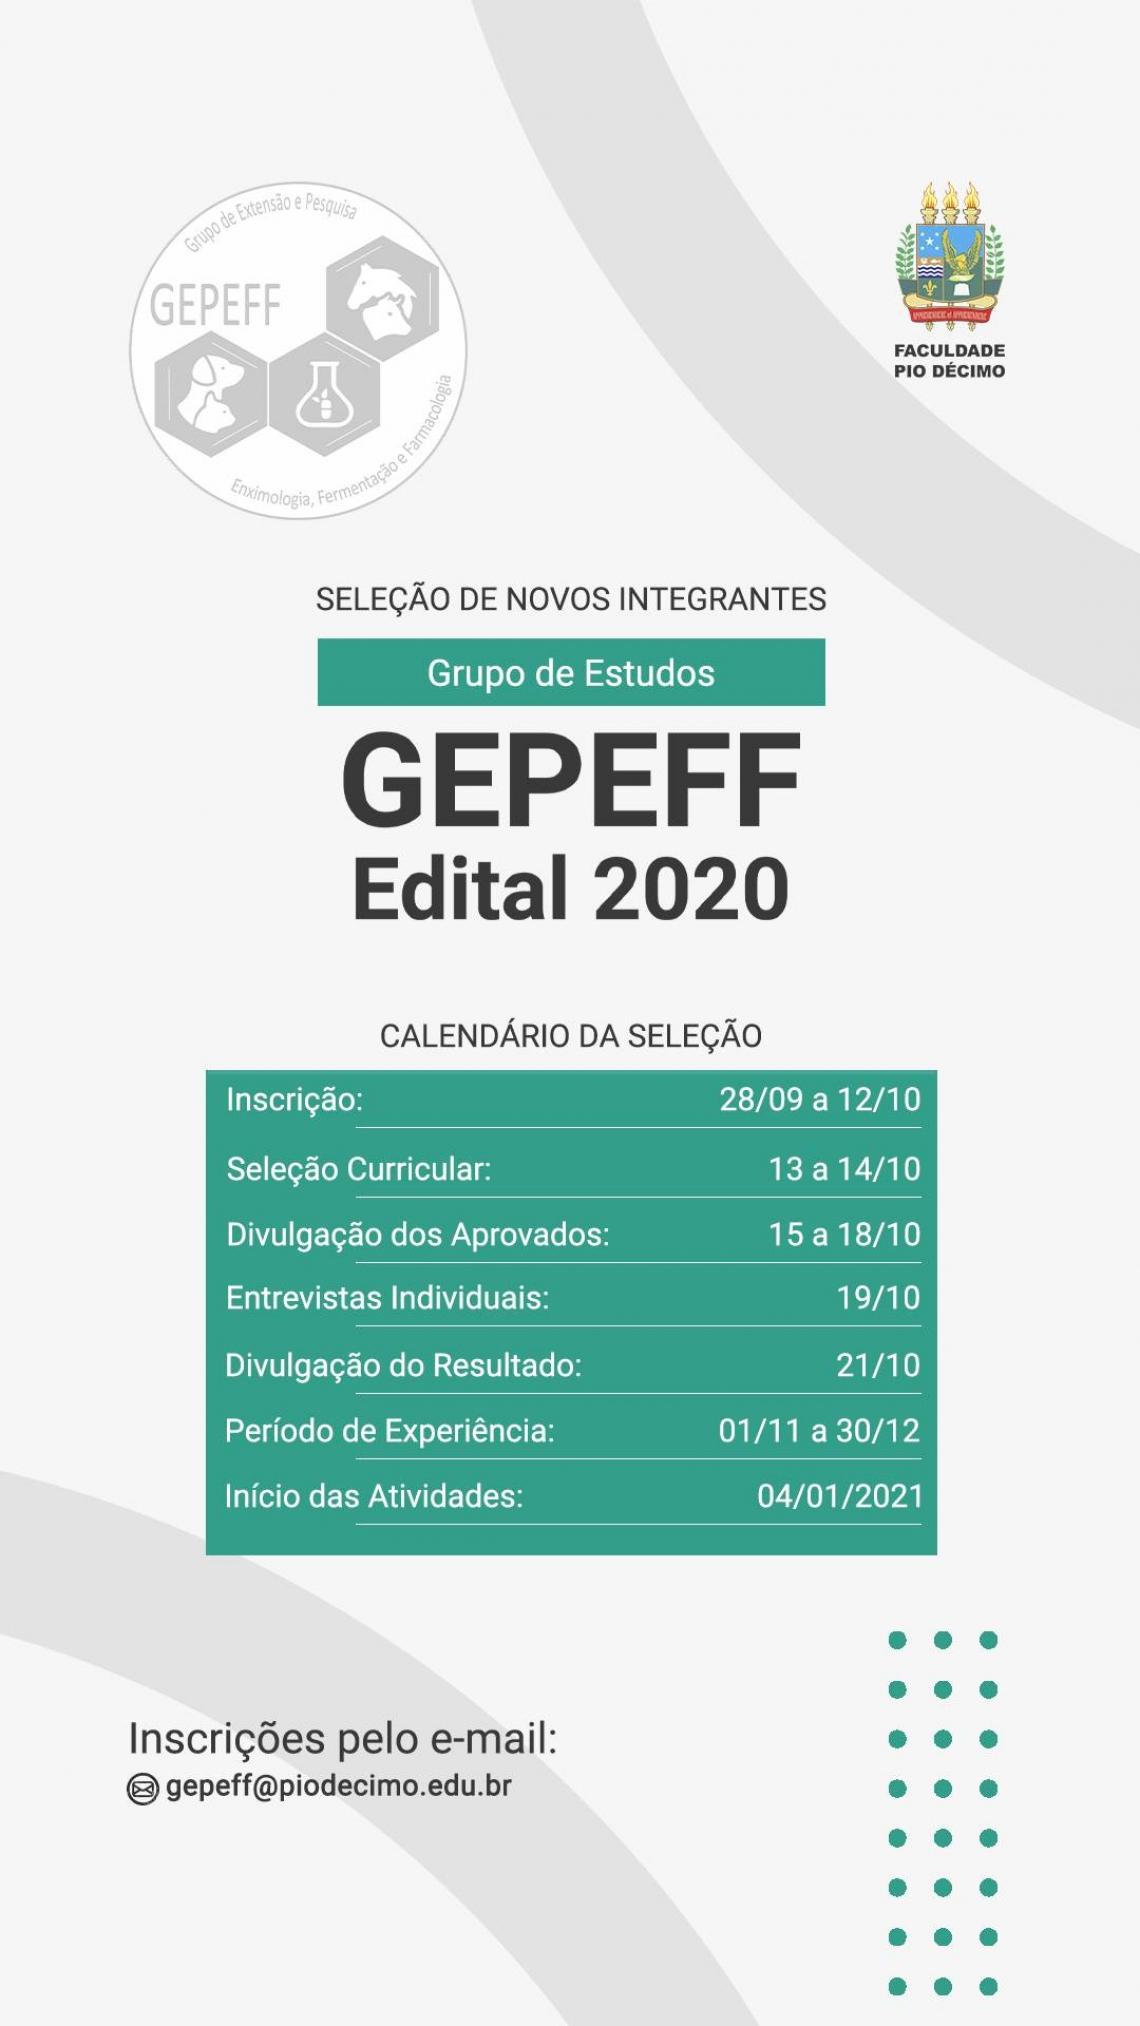 edital-gepeff_2.jpg